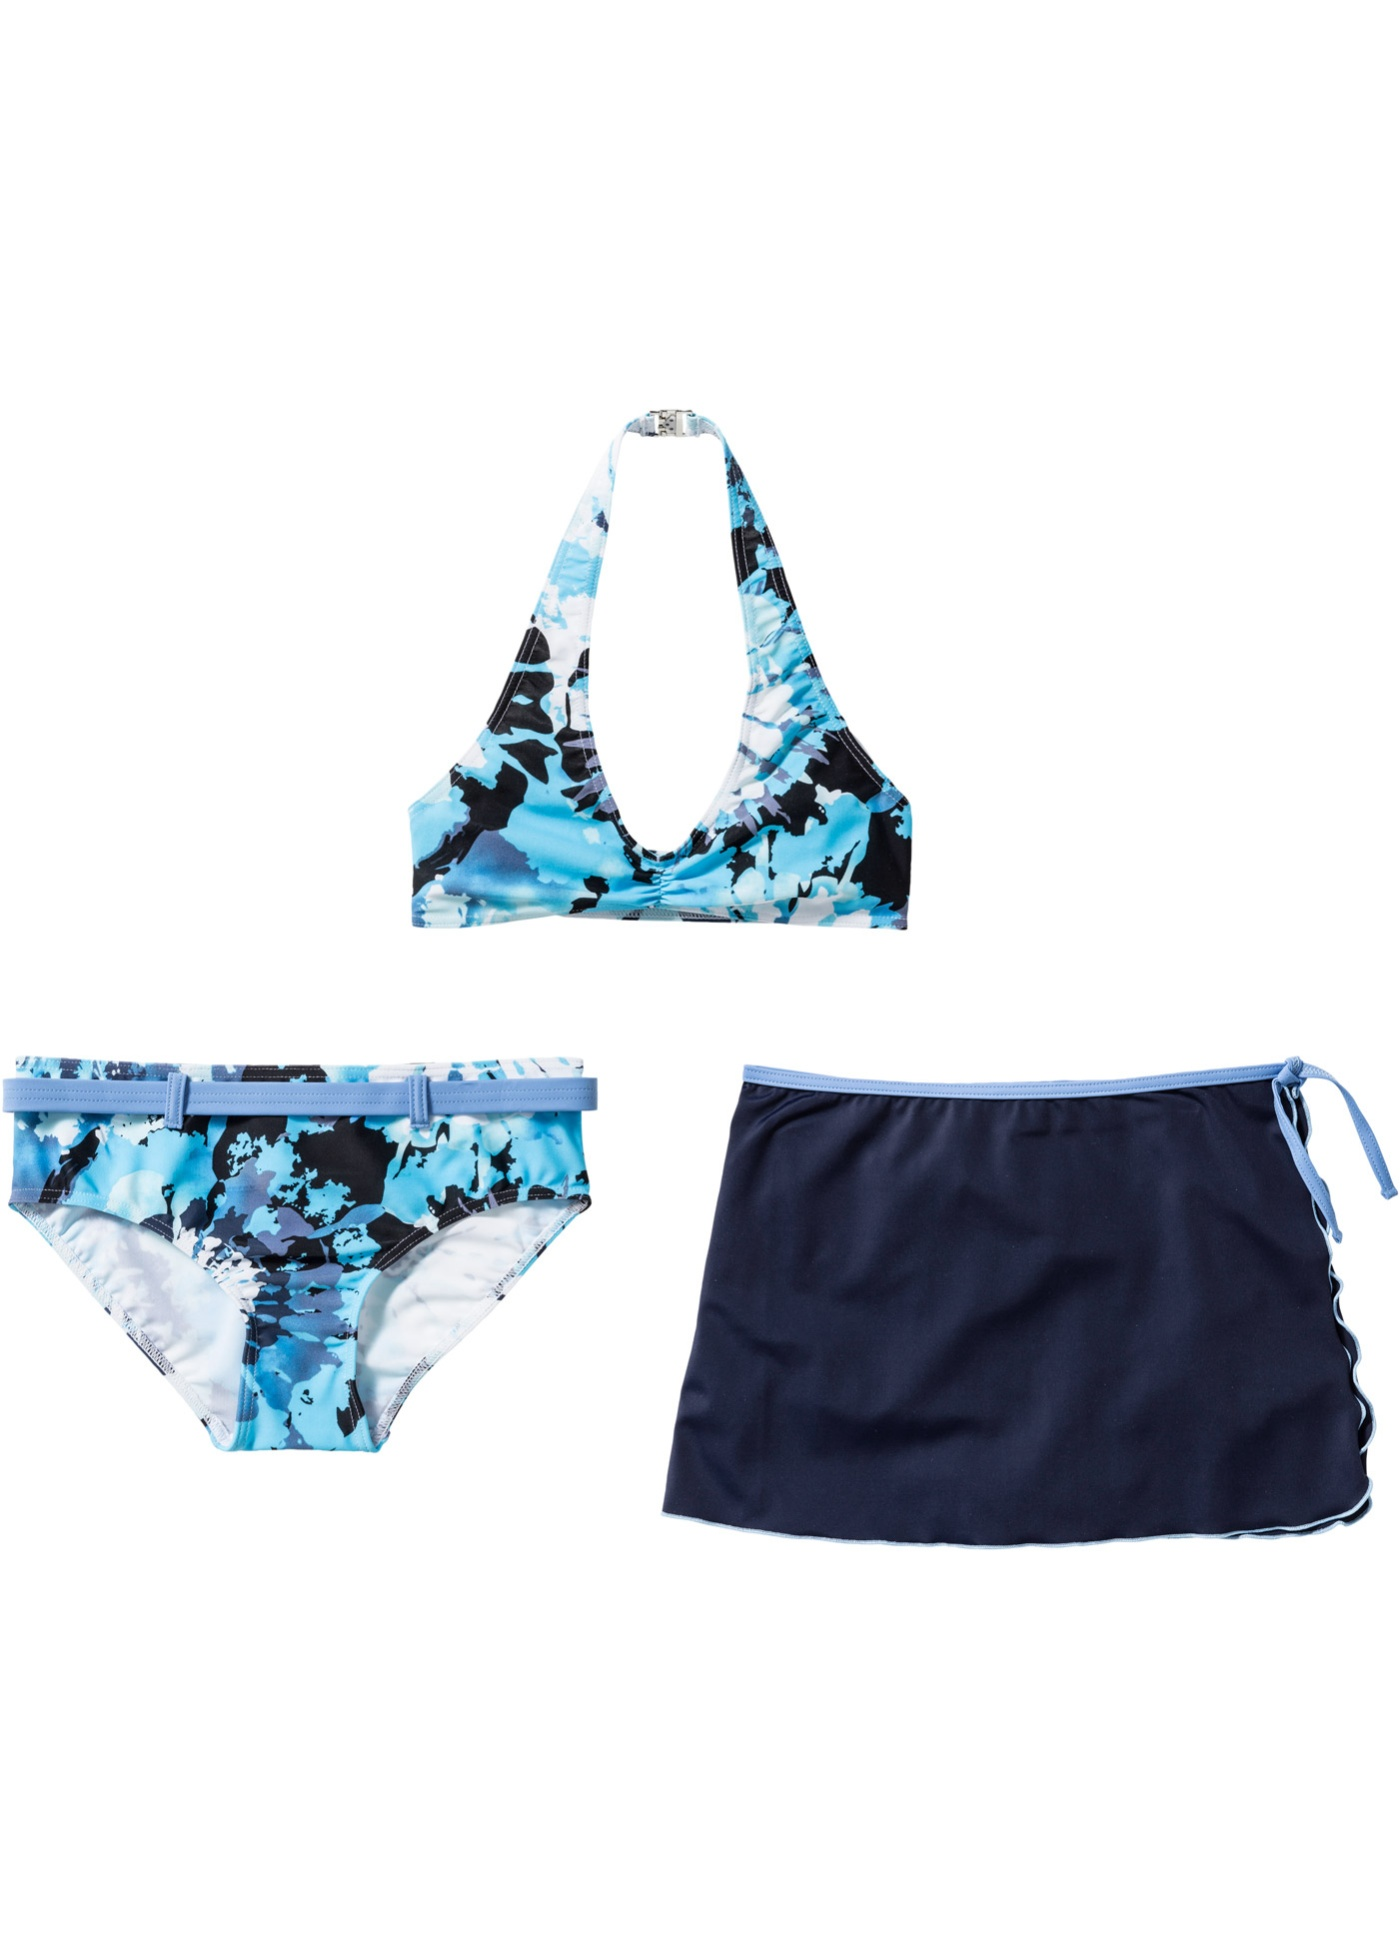 Bikini + gonna (set 3 pezzi) (Blu) - bpc bonprix collection